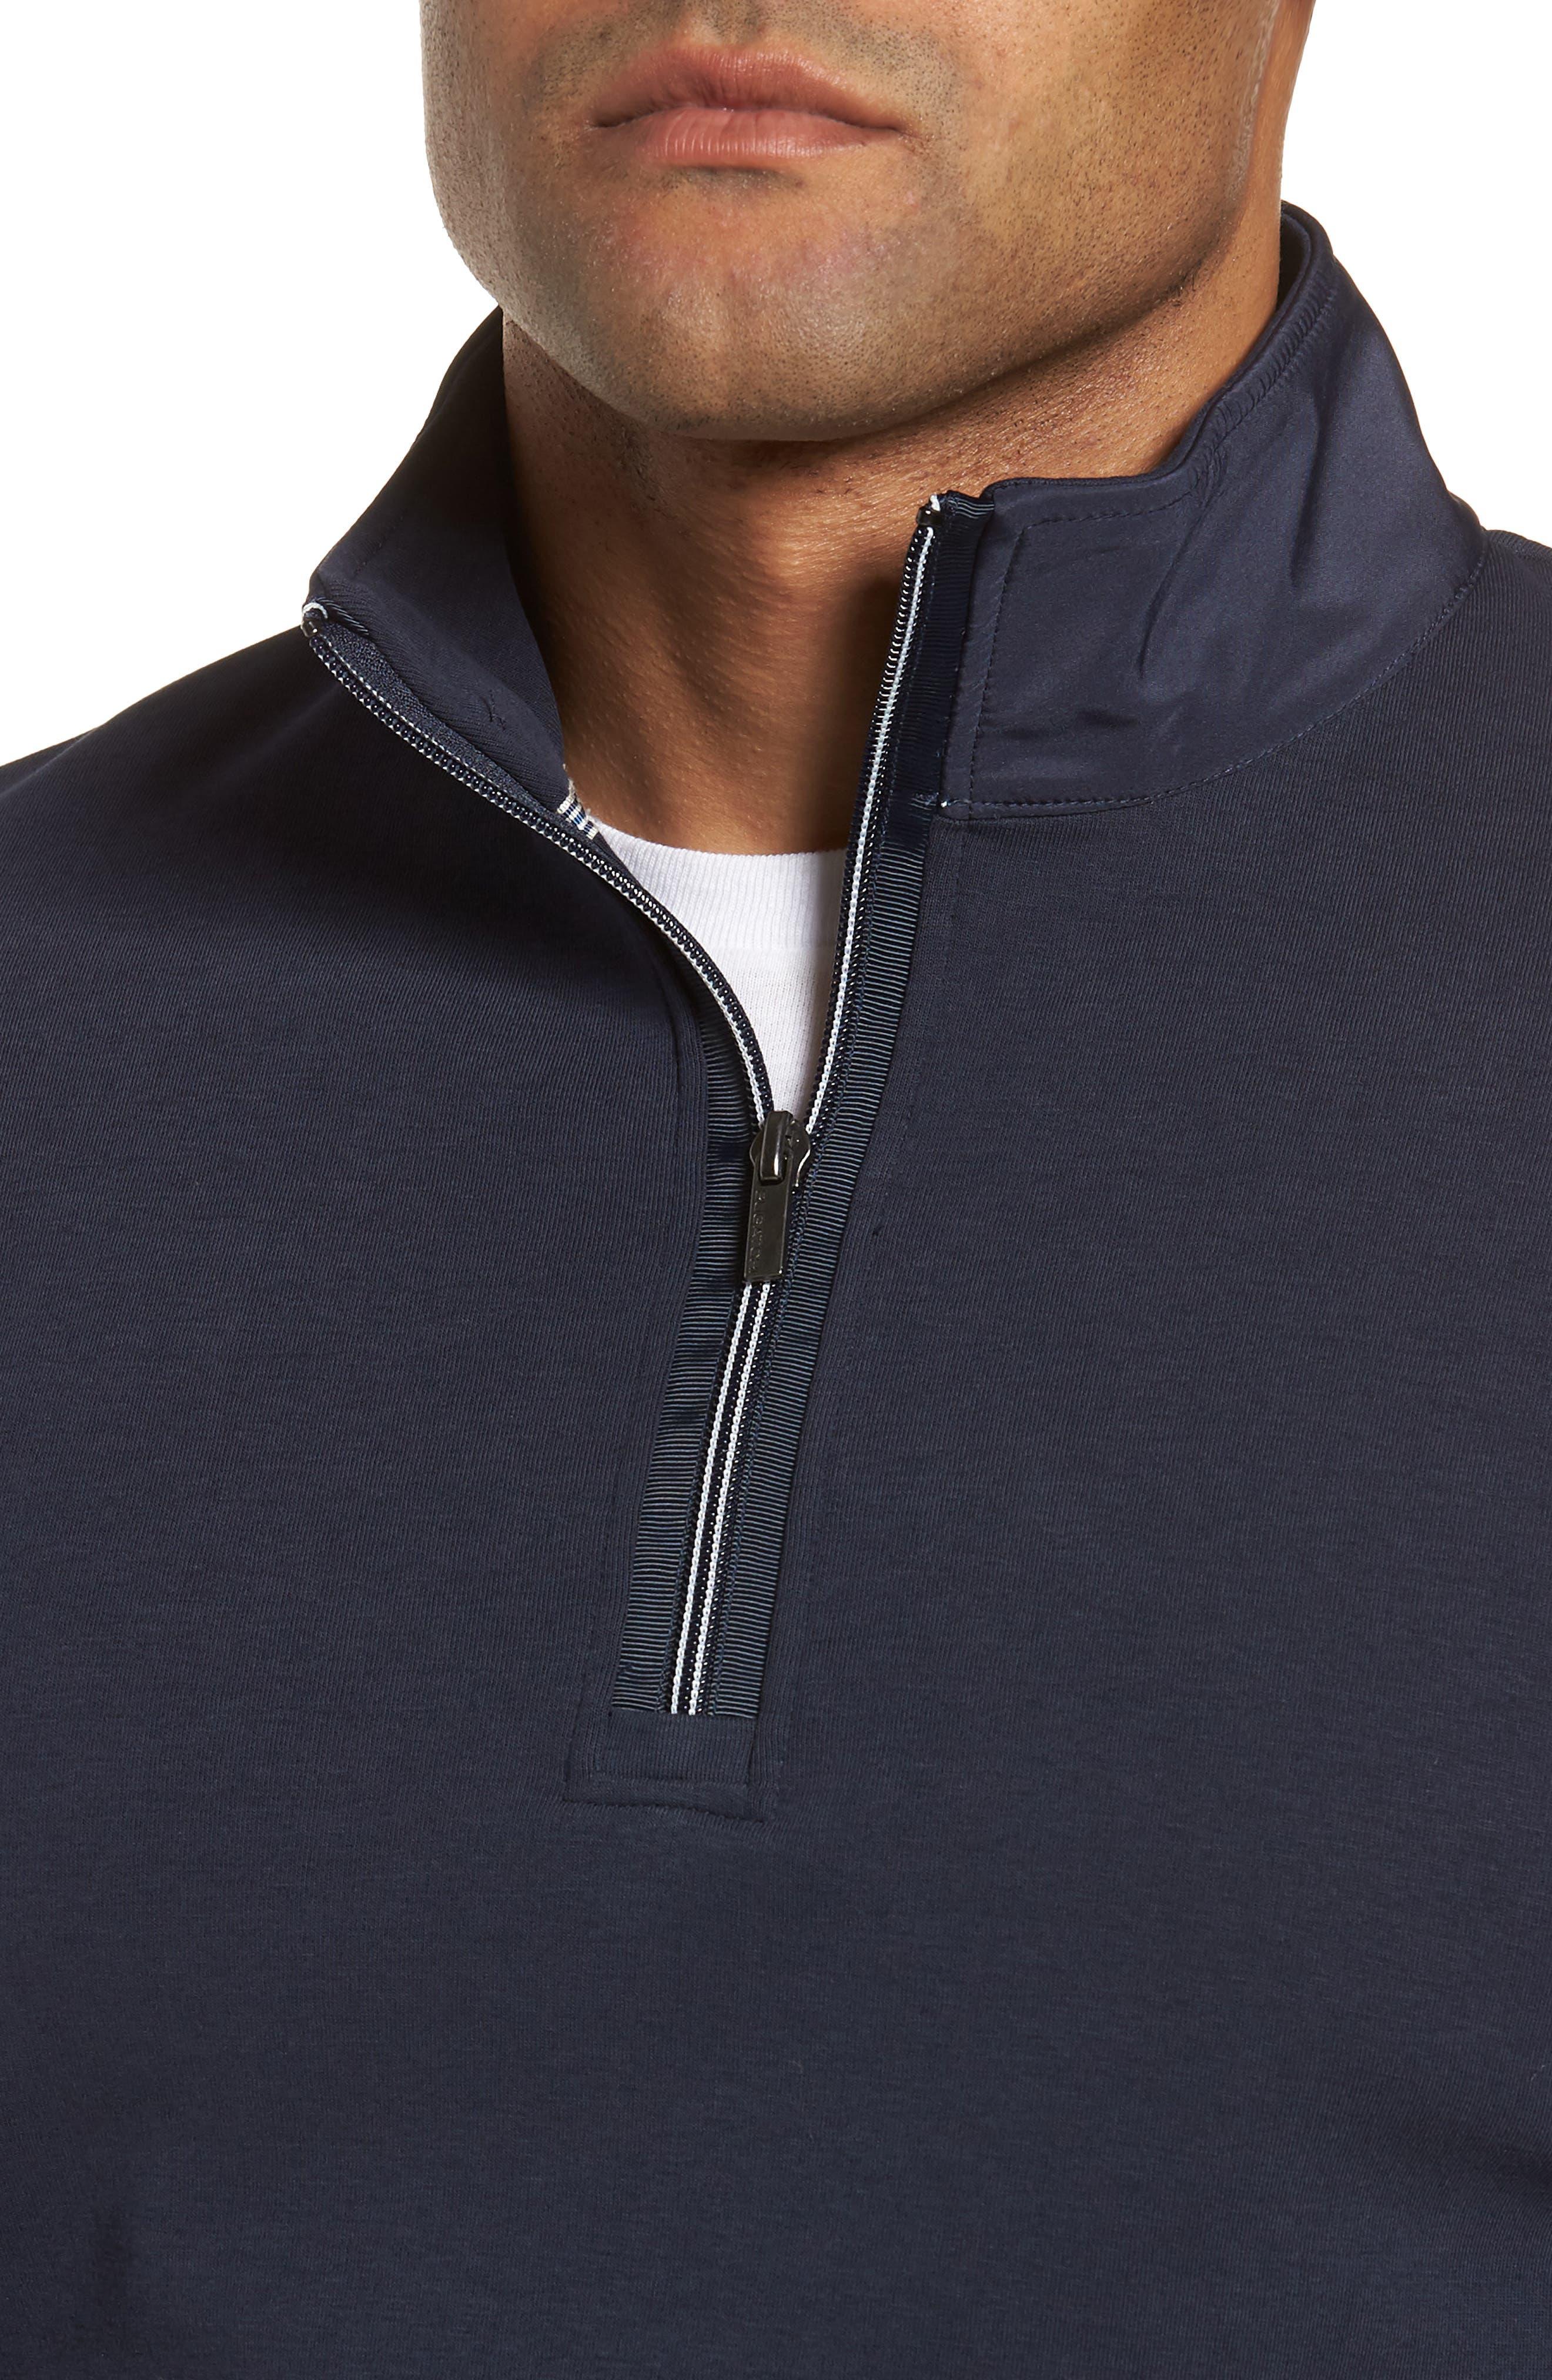 Regular Fit Quarter Zip Pullover,                             Alternate thumbnail 4, color,                             411